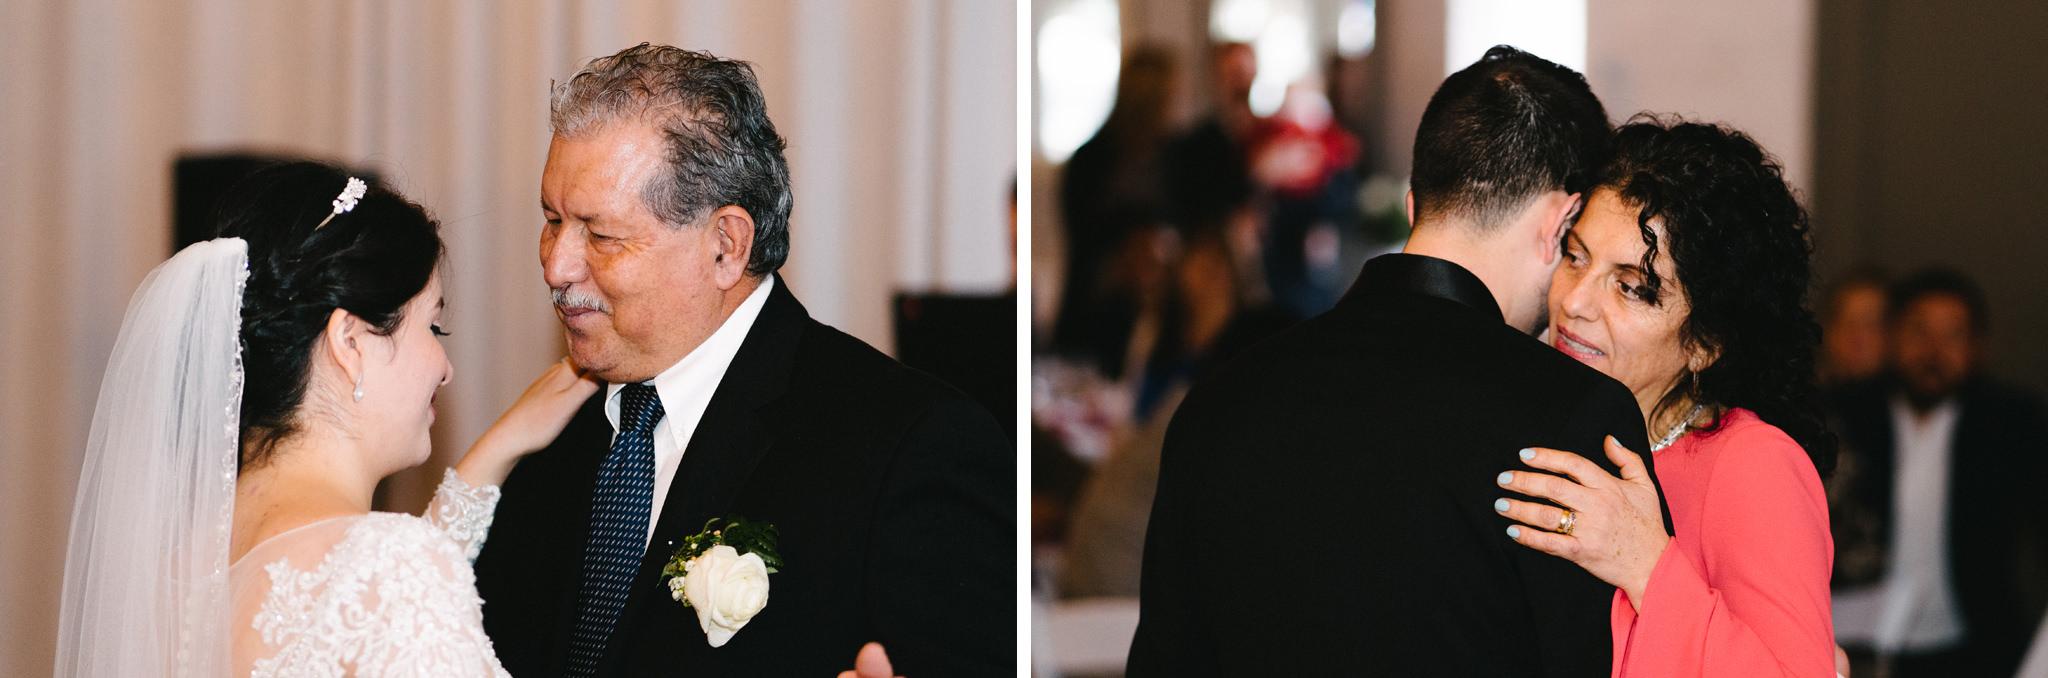 045-rempel-photography-chicago-wedding-inspiration-susan-daniel-michigan-metro-detroit-christian-church-holly-vault-cupcakes-and-kisses.jpg